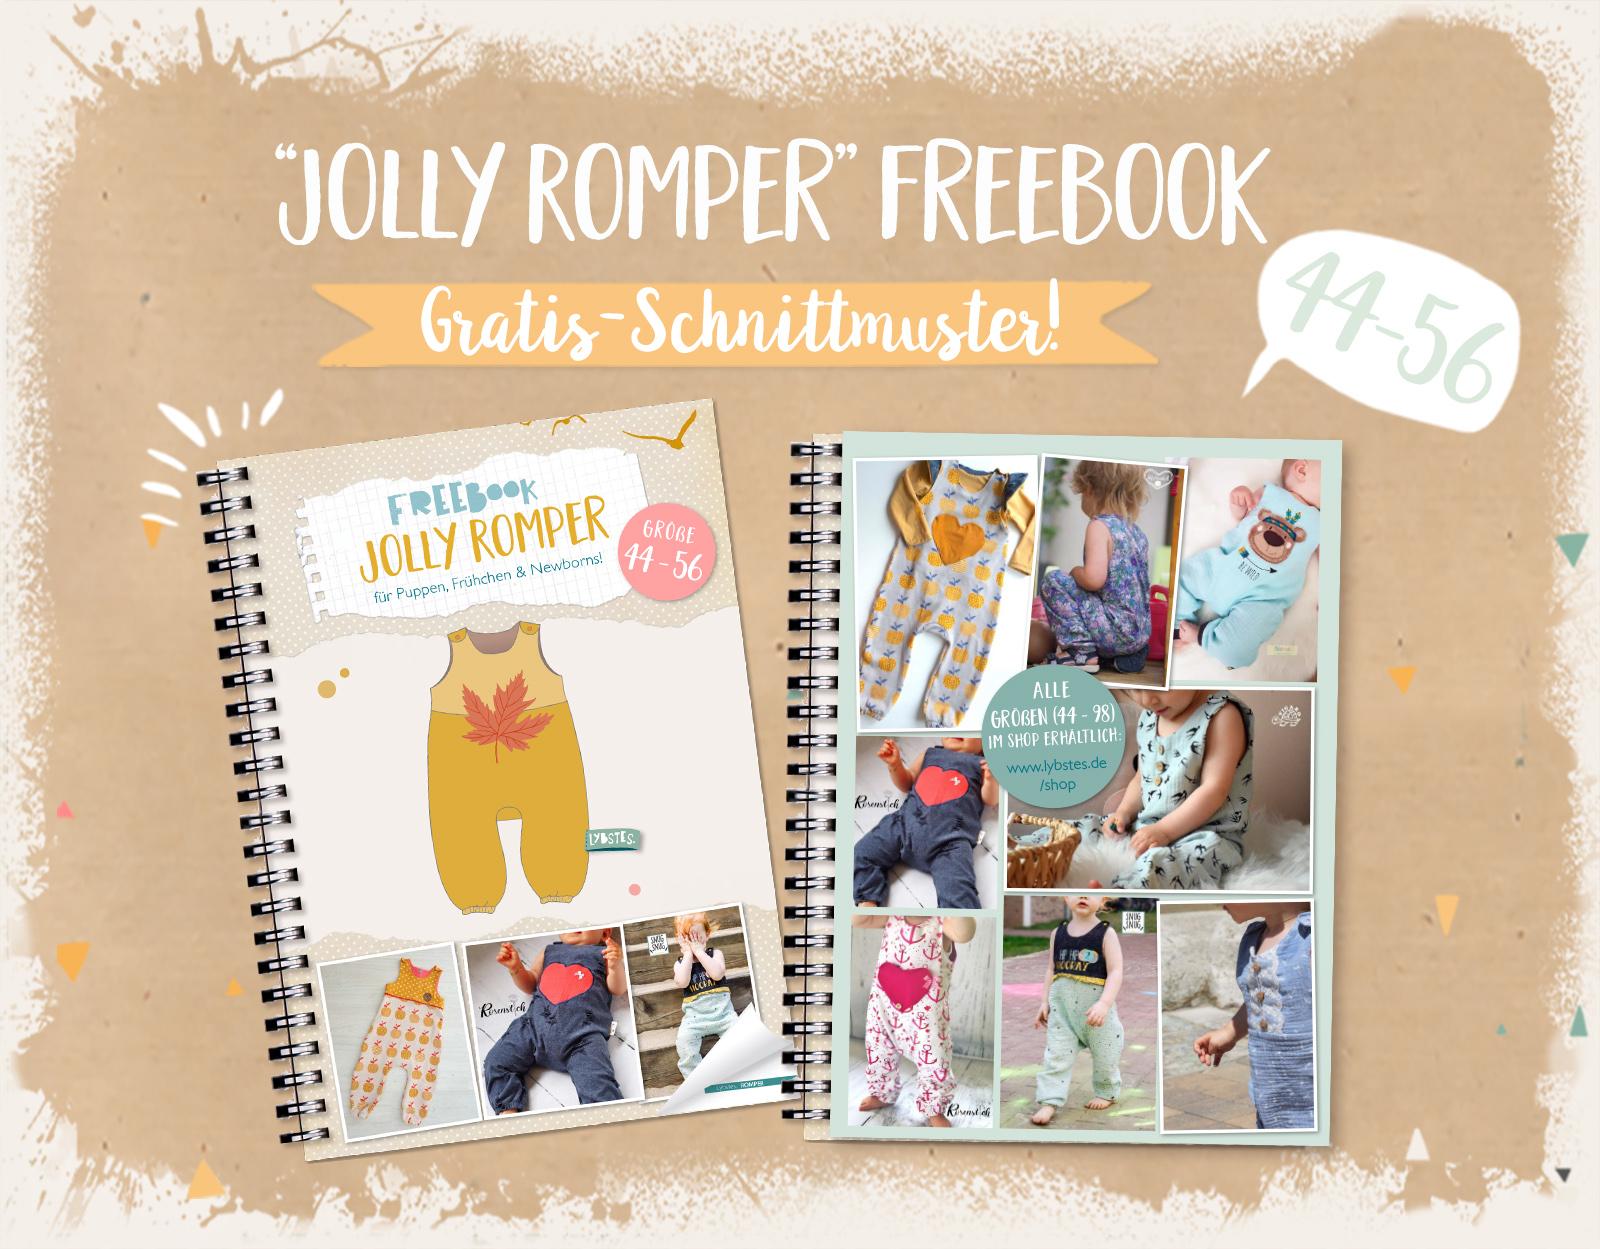 FREEBOOK: Jolly Romper - der Strampler (Gr. 44 - 56)